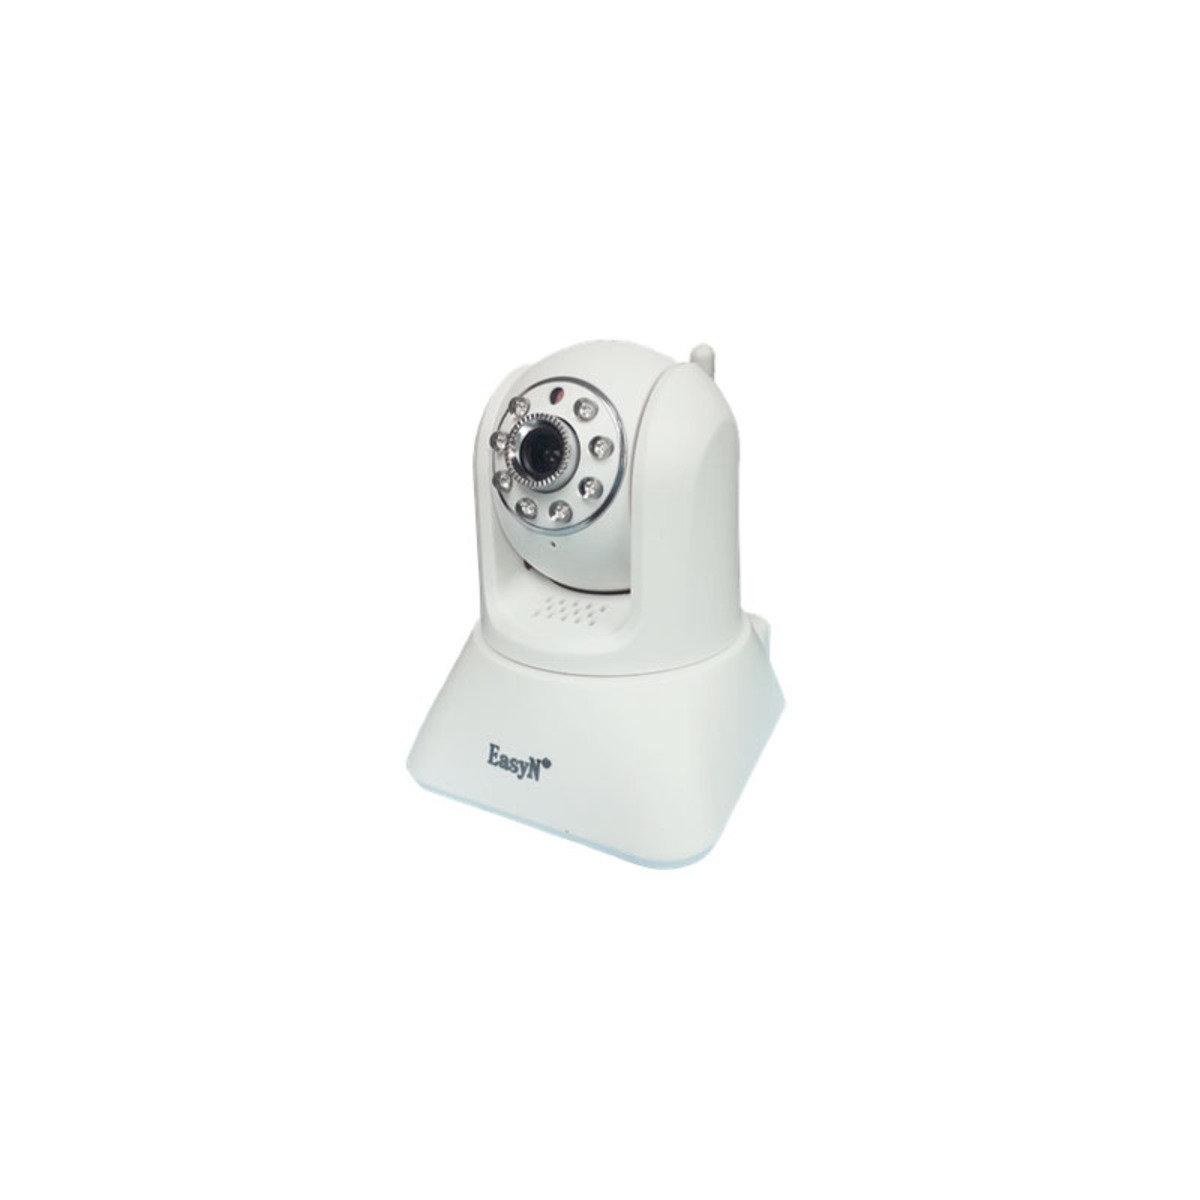 960p 高清旋轉式多角度無線網路攝影機 H3-187W